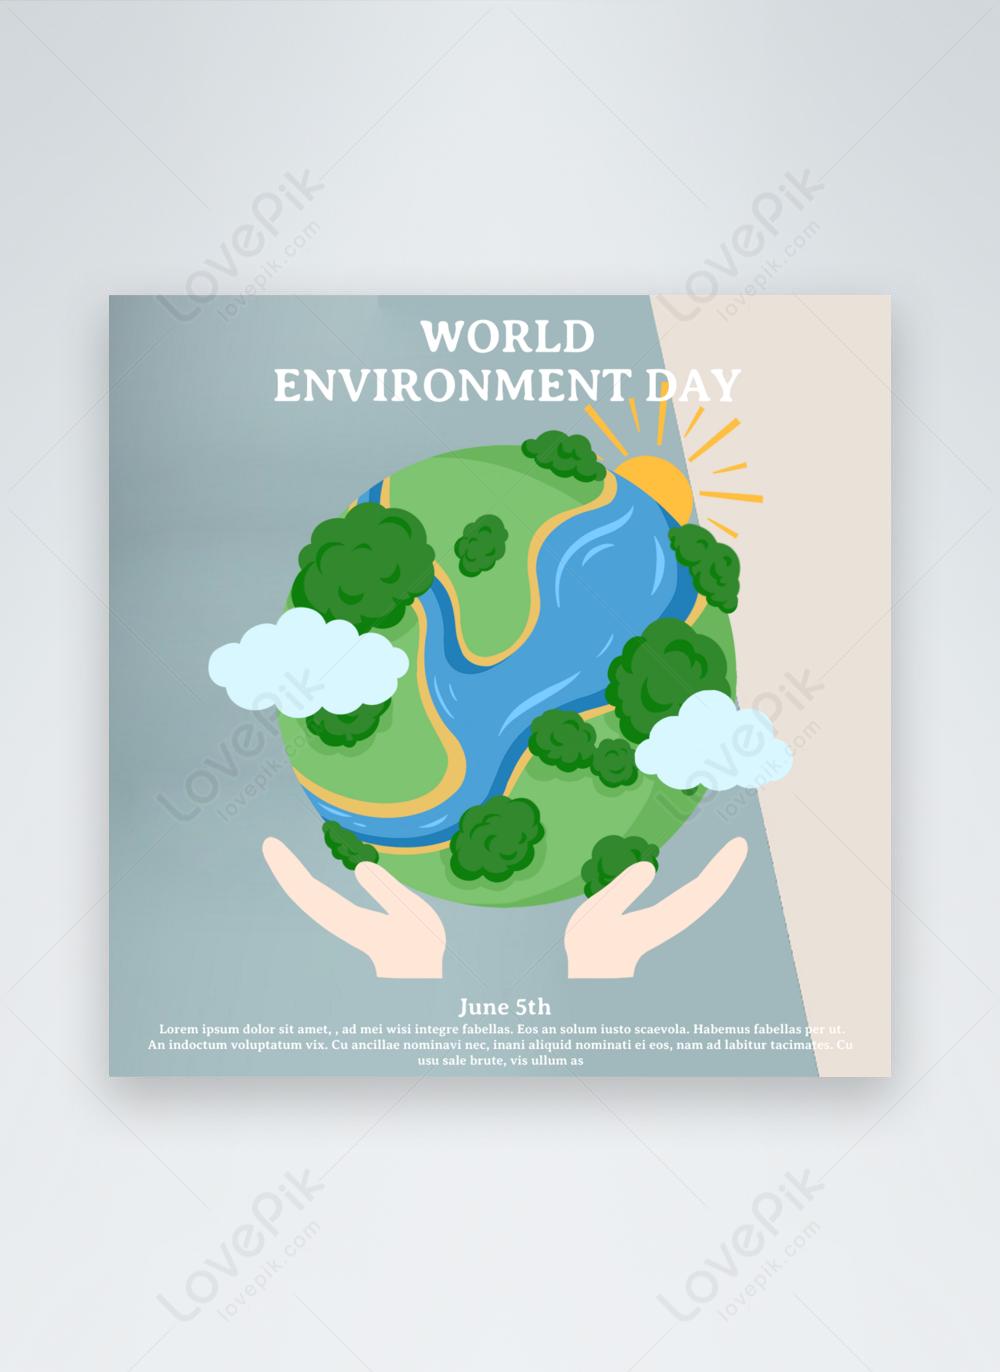 kartun template liburan hari lingkungan dunia biru